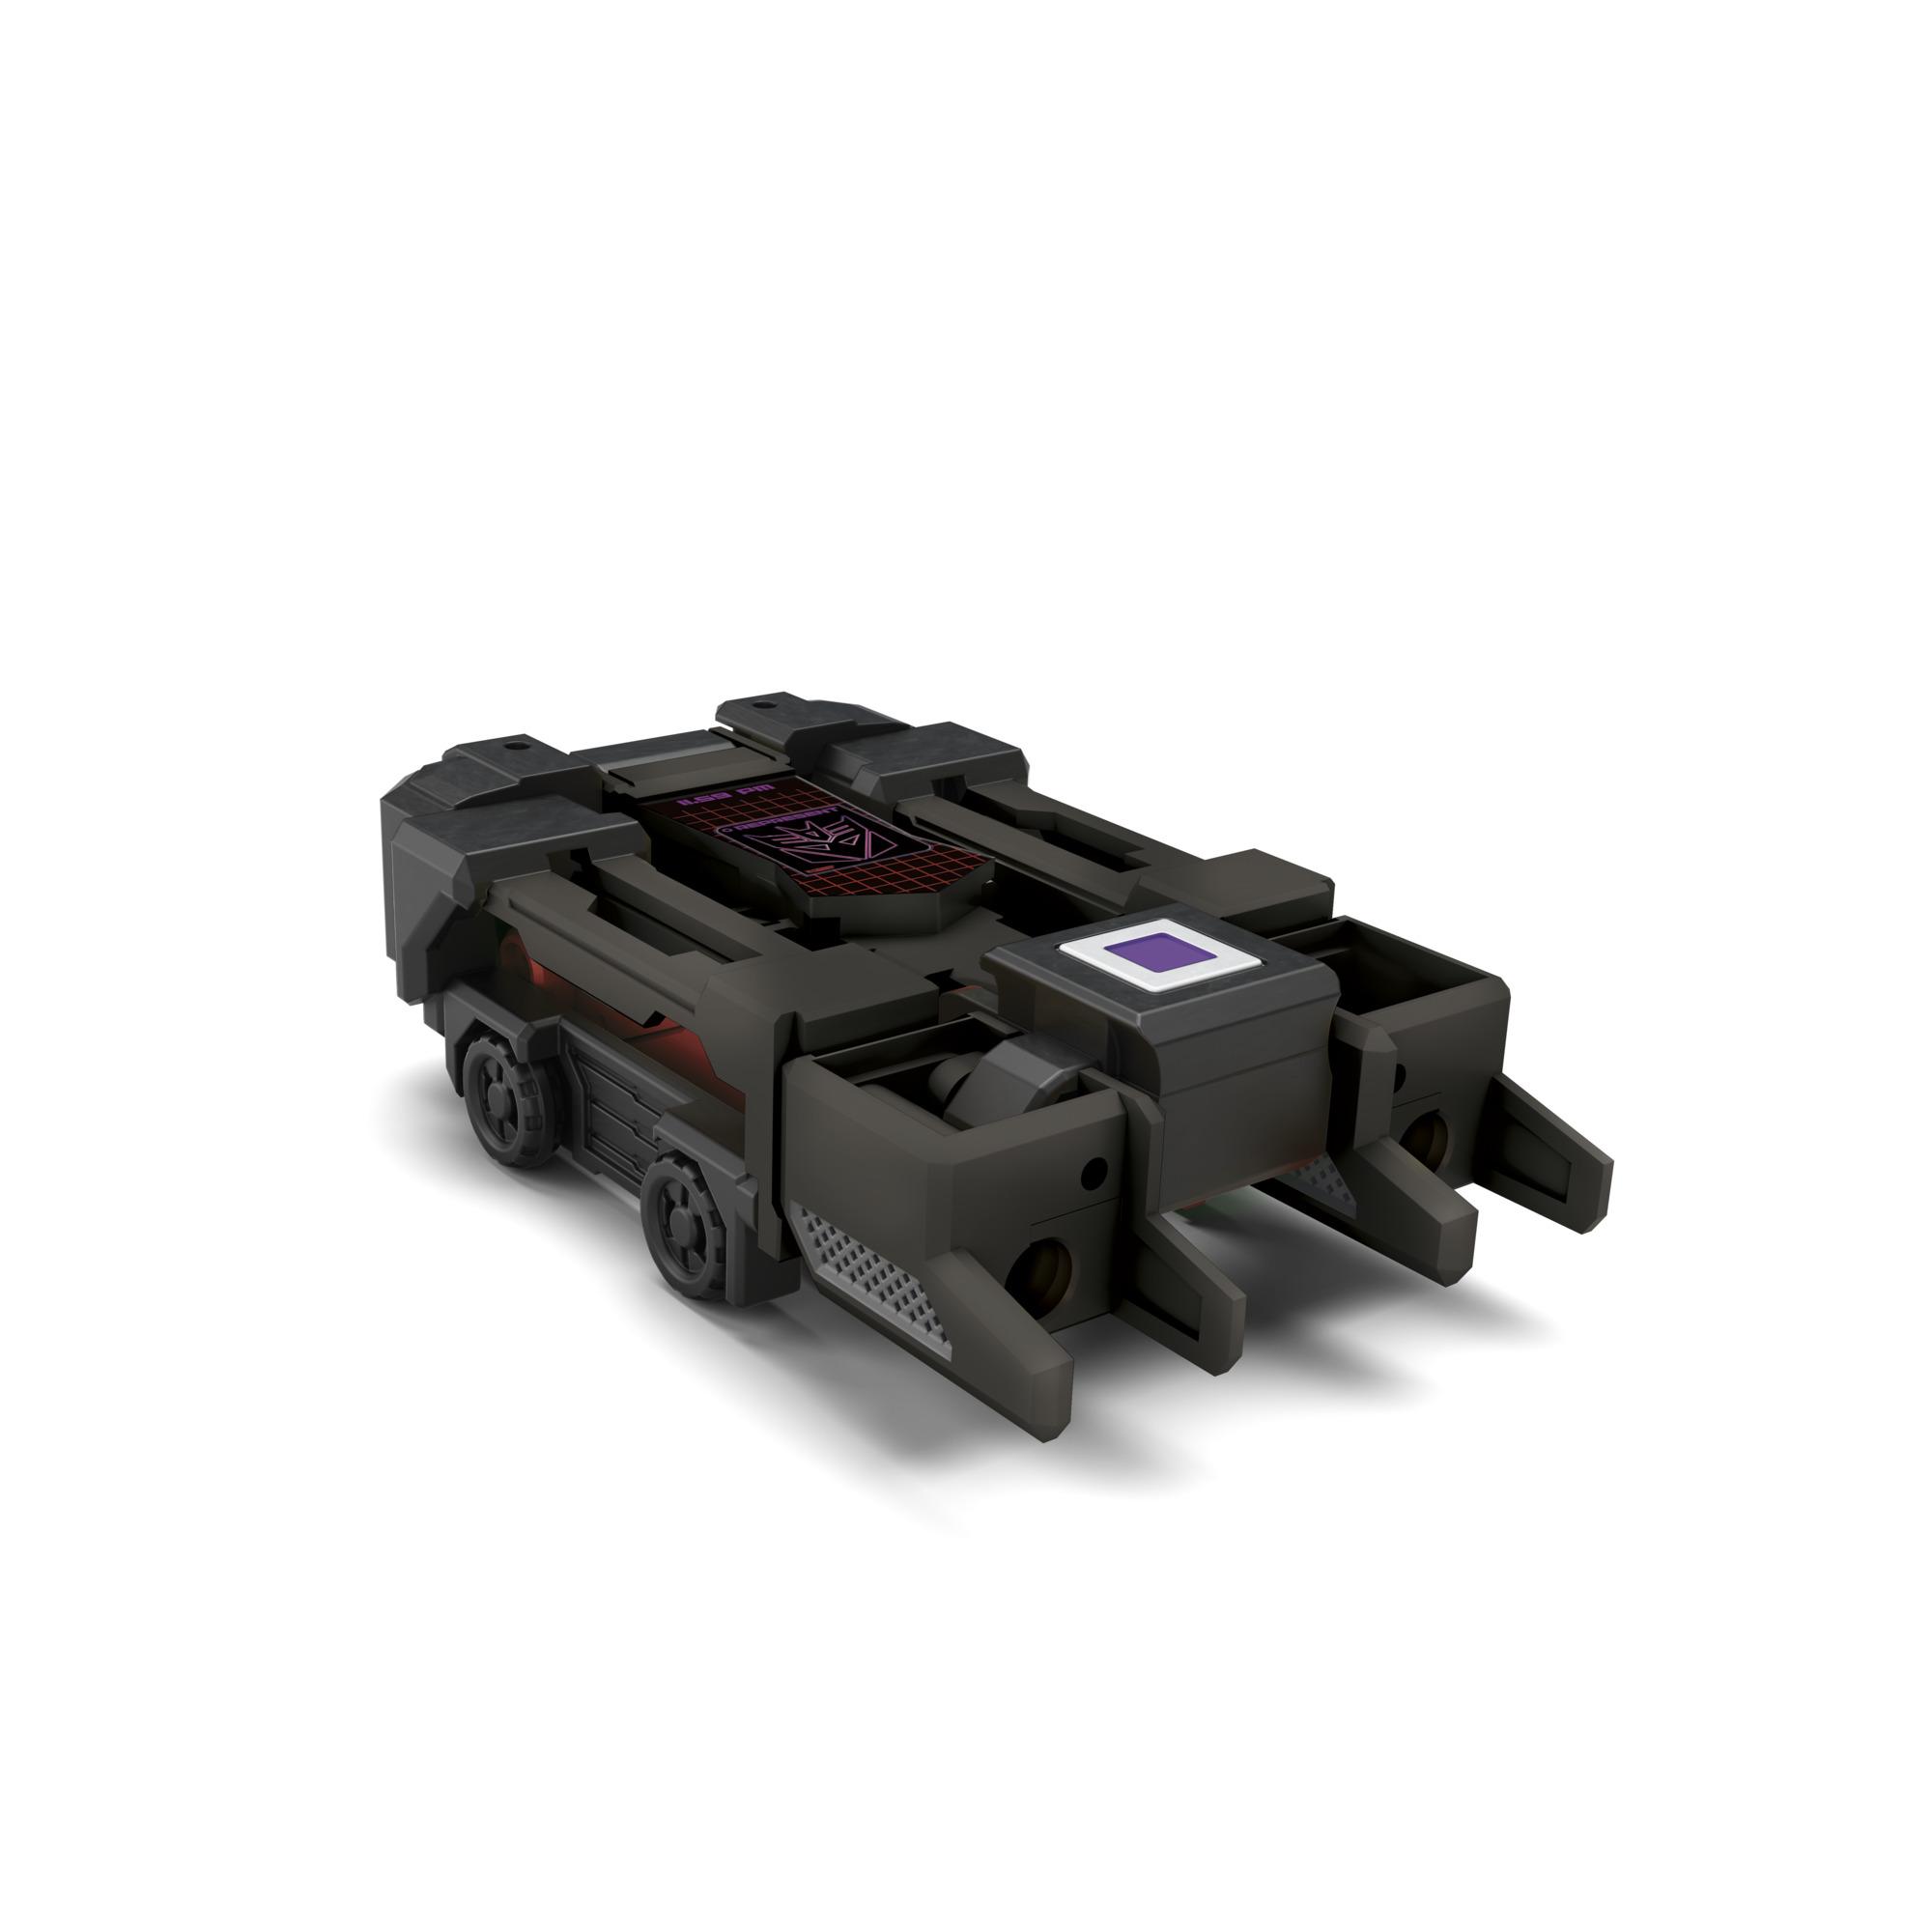 Legends LASERBEAK Vehicle Mode